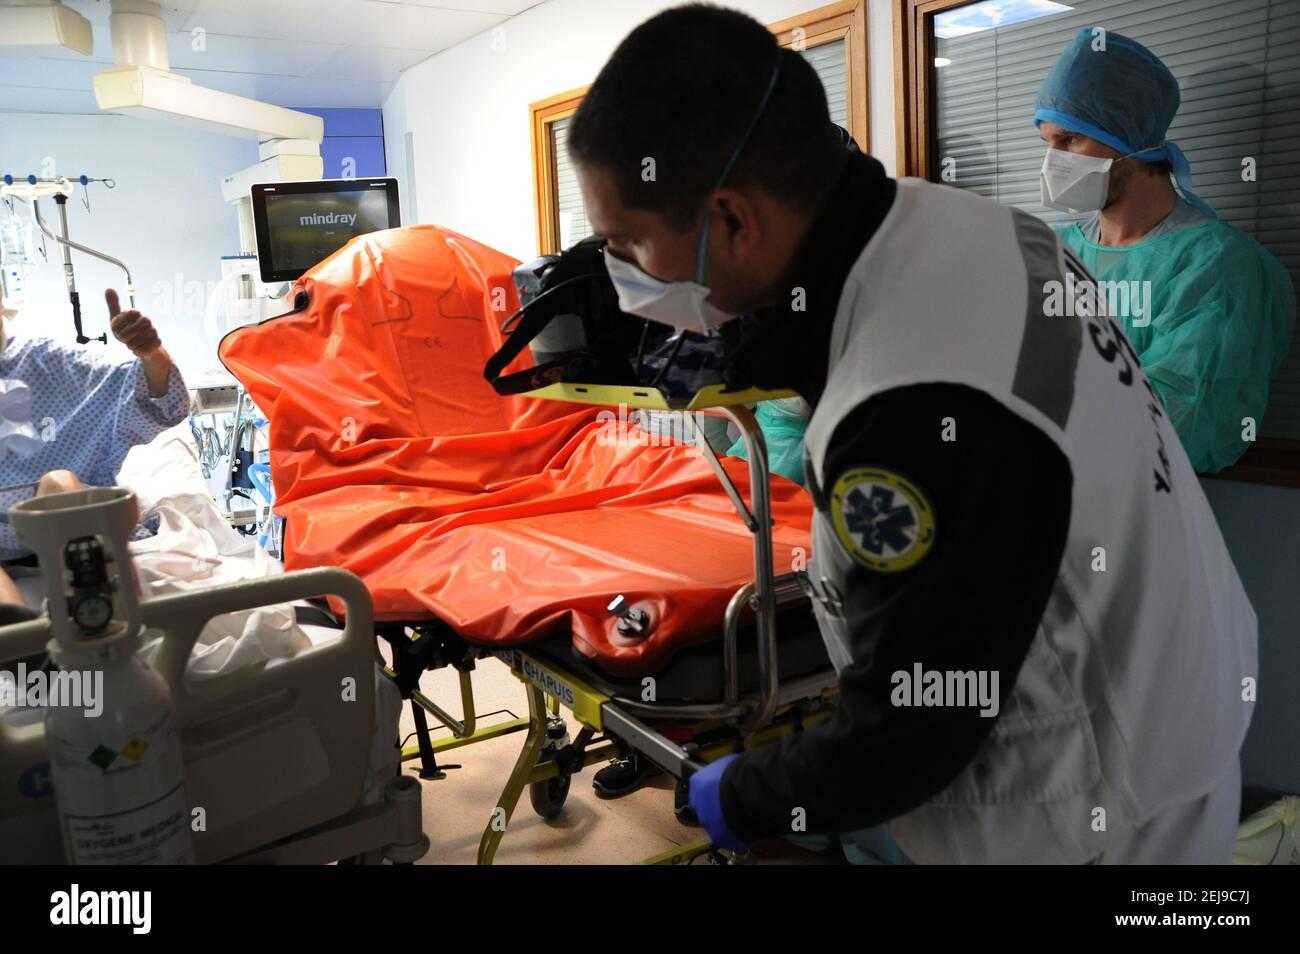 Urgences Covid-19 Banque D'Images